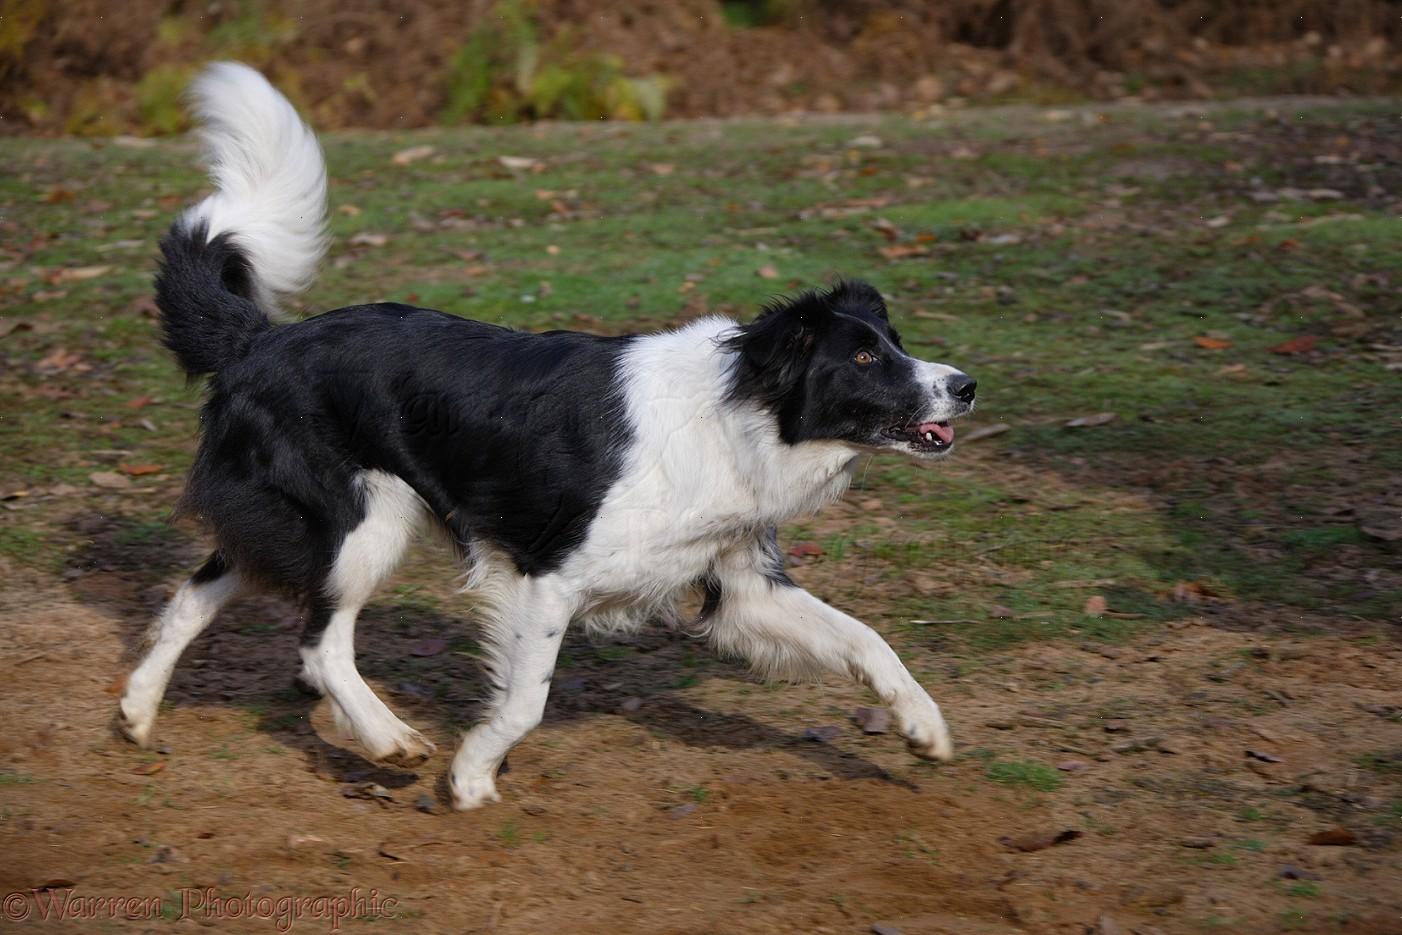 Dog Black And White Border Collie Running Photo Wp17642